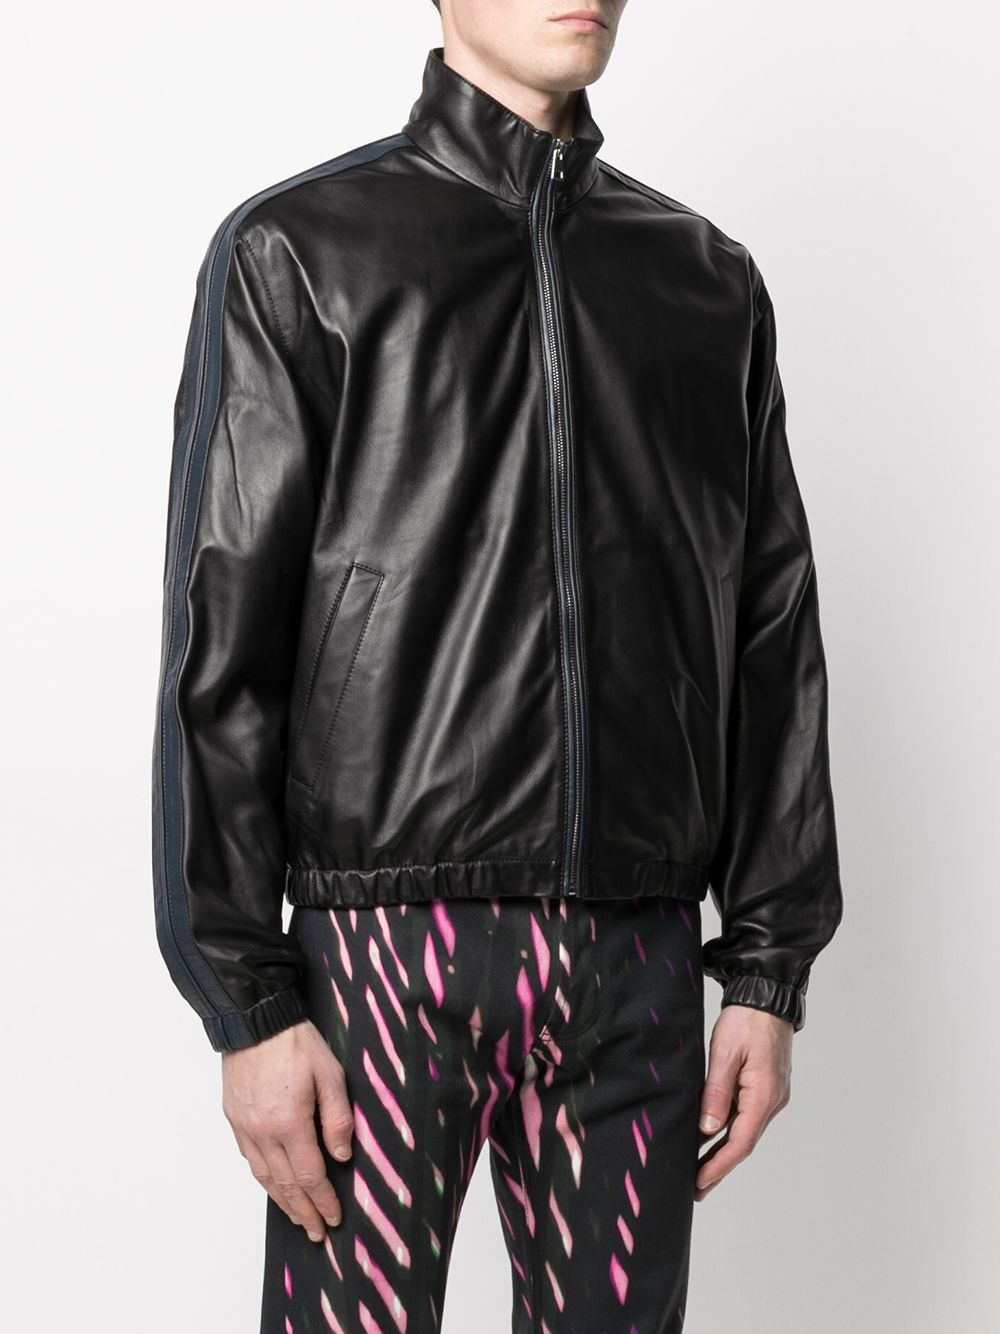 leather jacket man black MARNI | Jackets | JUMY0026Q0 SY153800N99